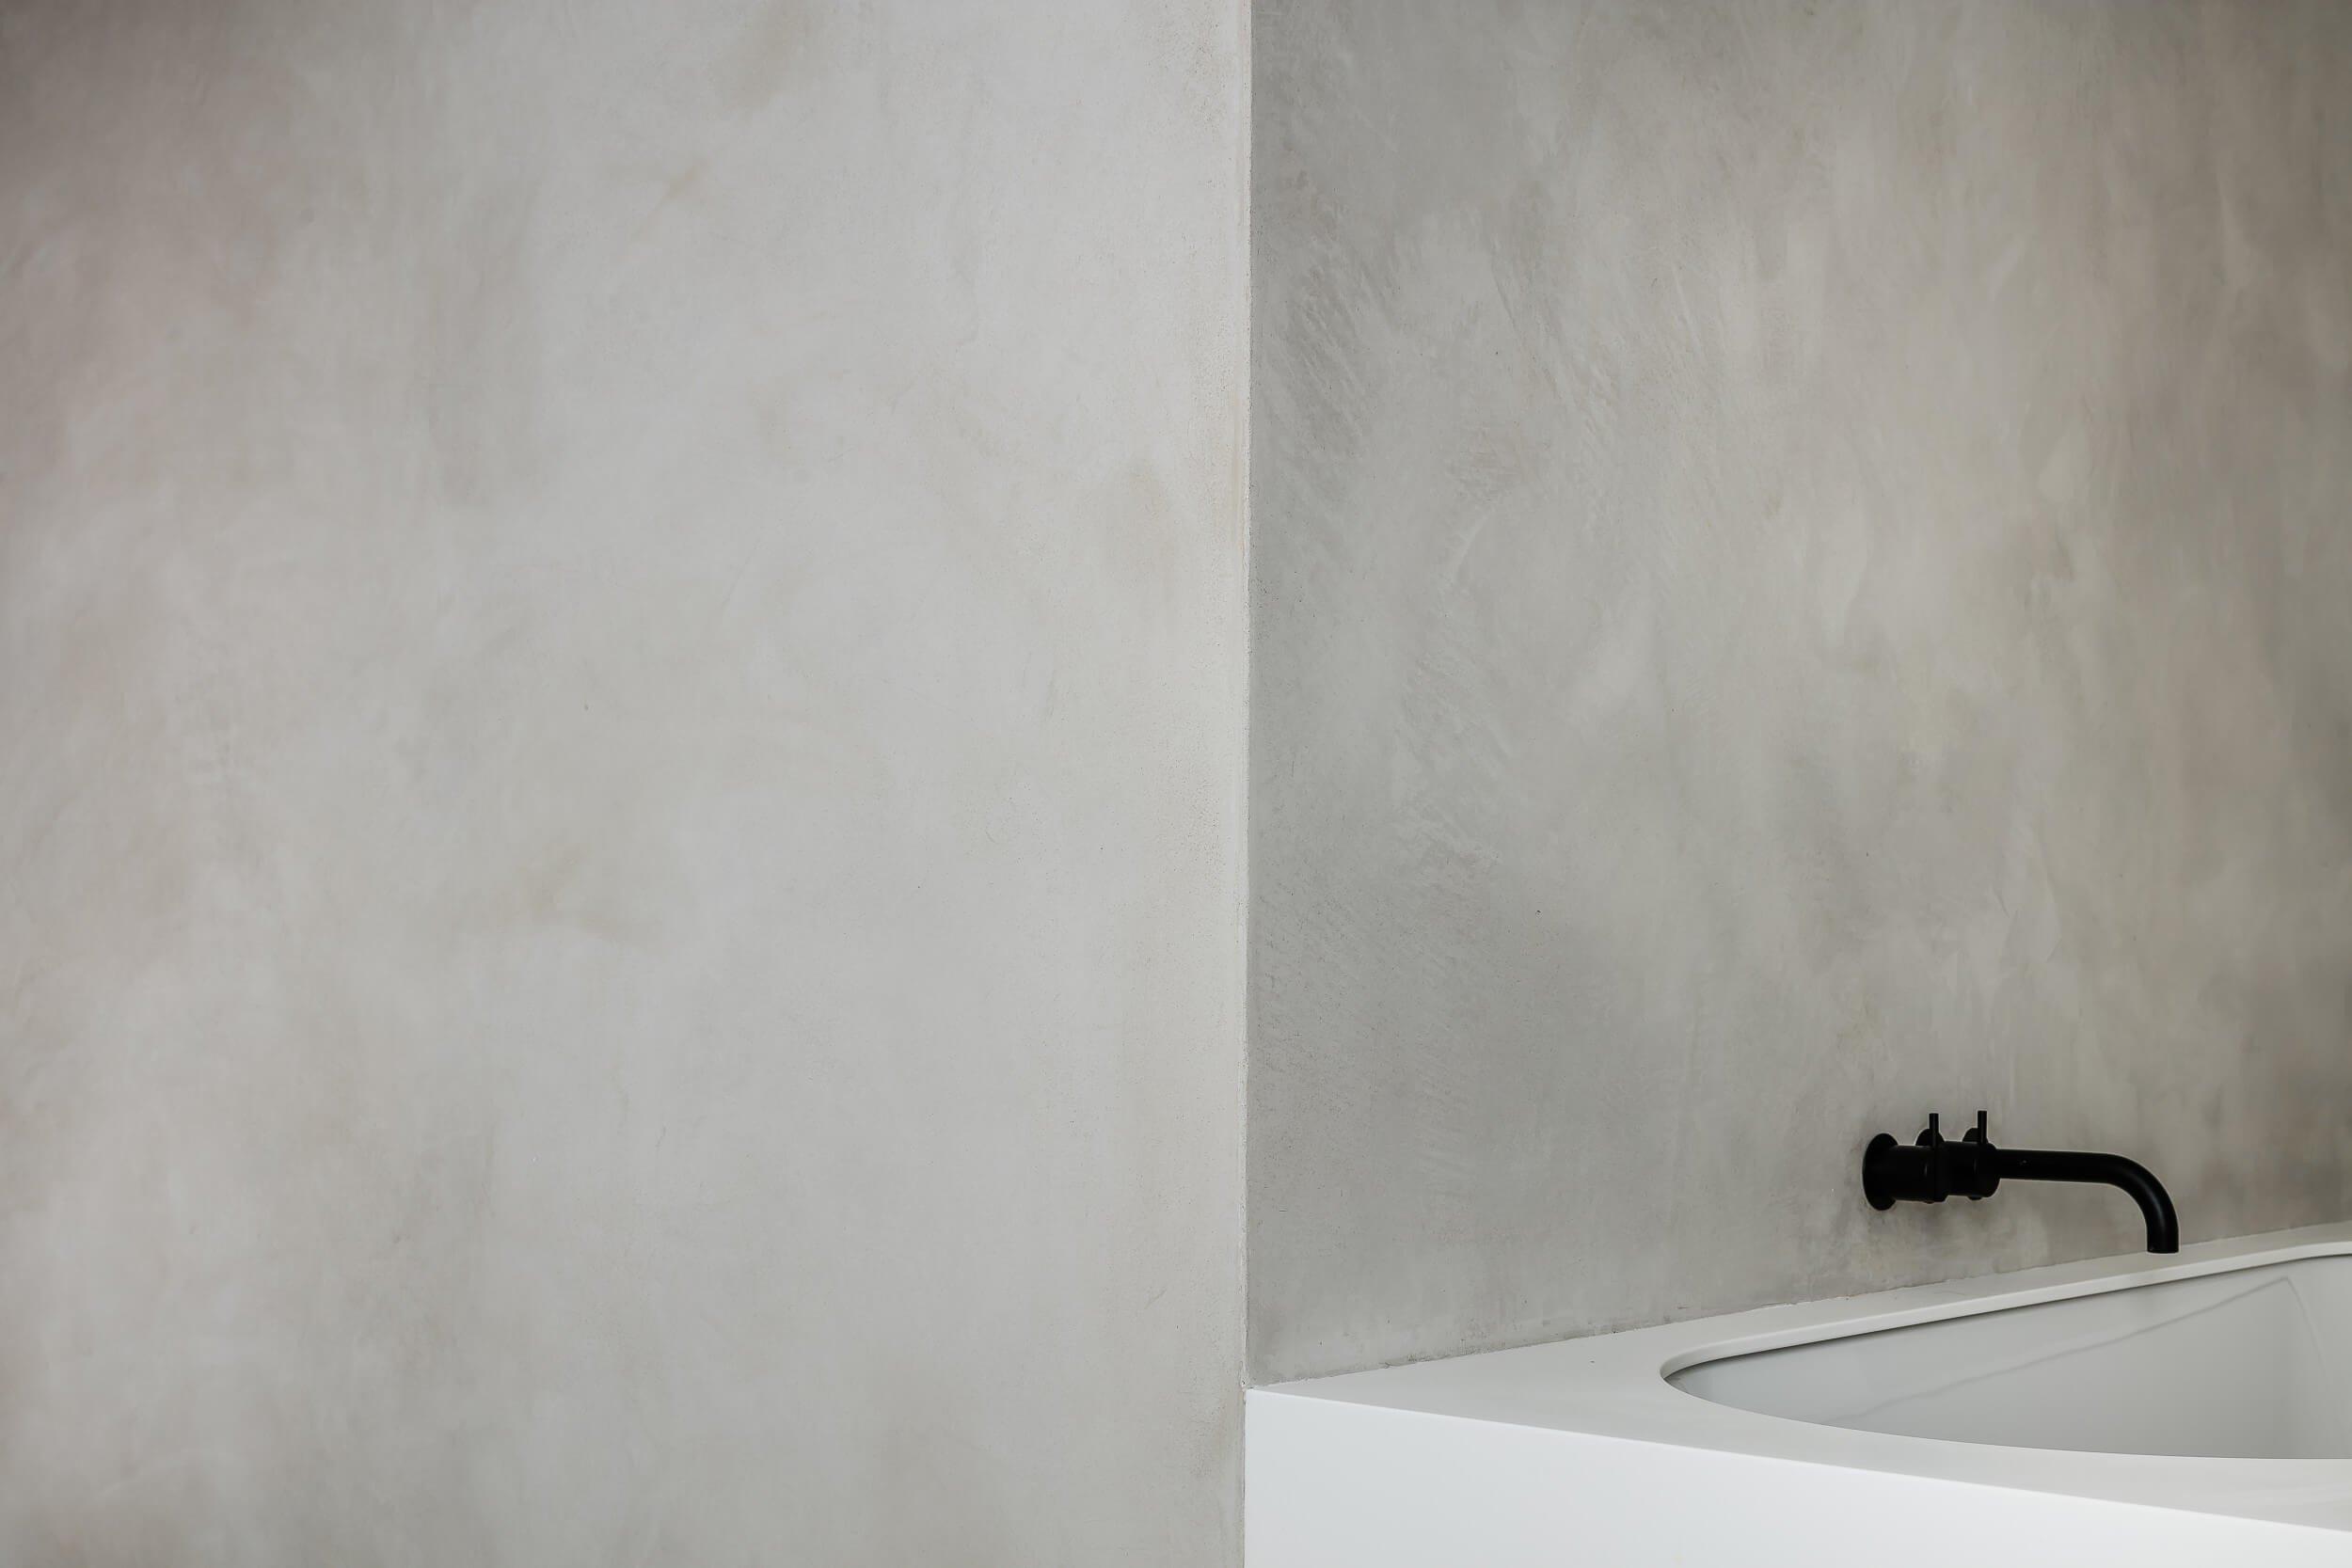 Rietveldprojects.be-five-am-rrr-odilon-creations-photobycafeine32.jpg